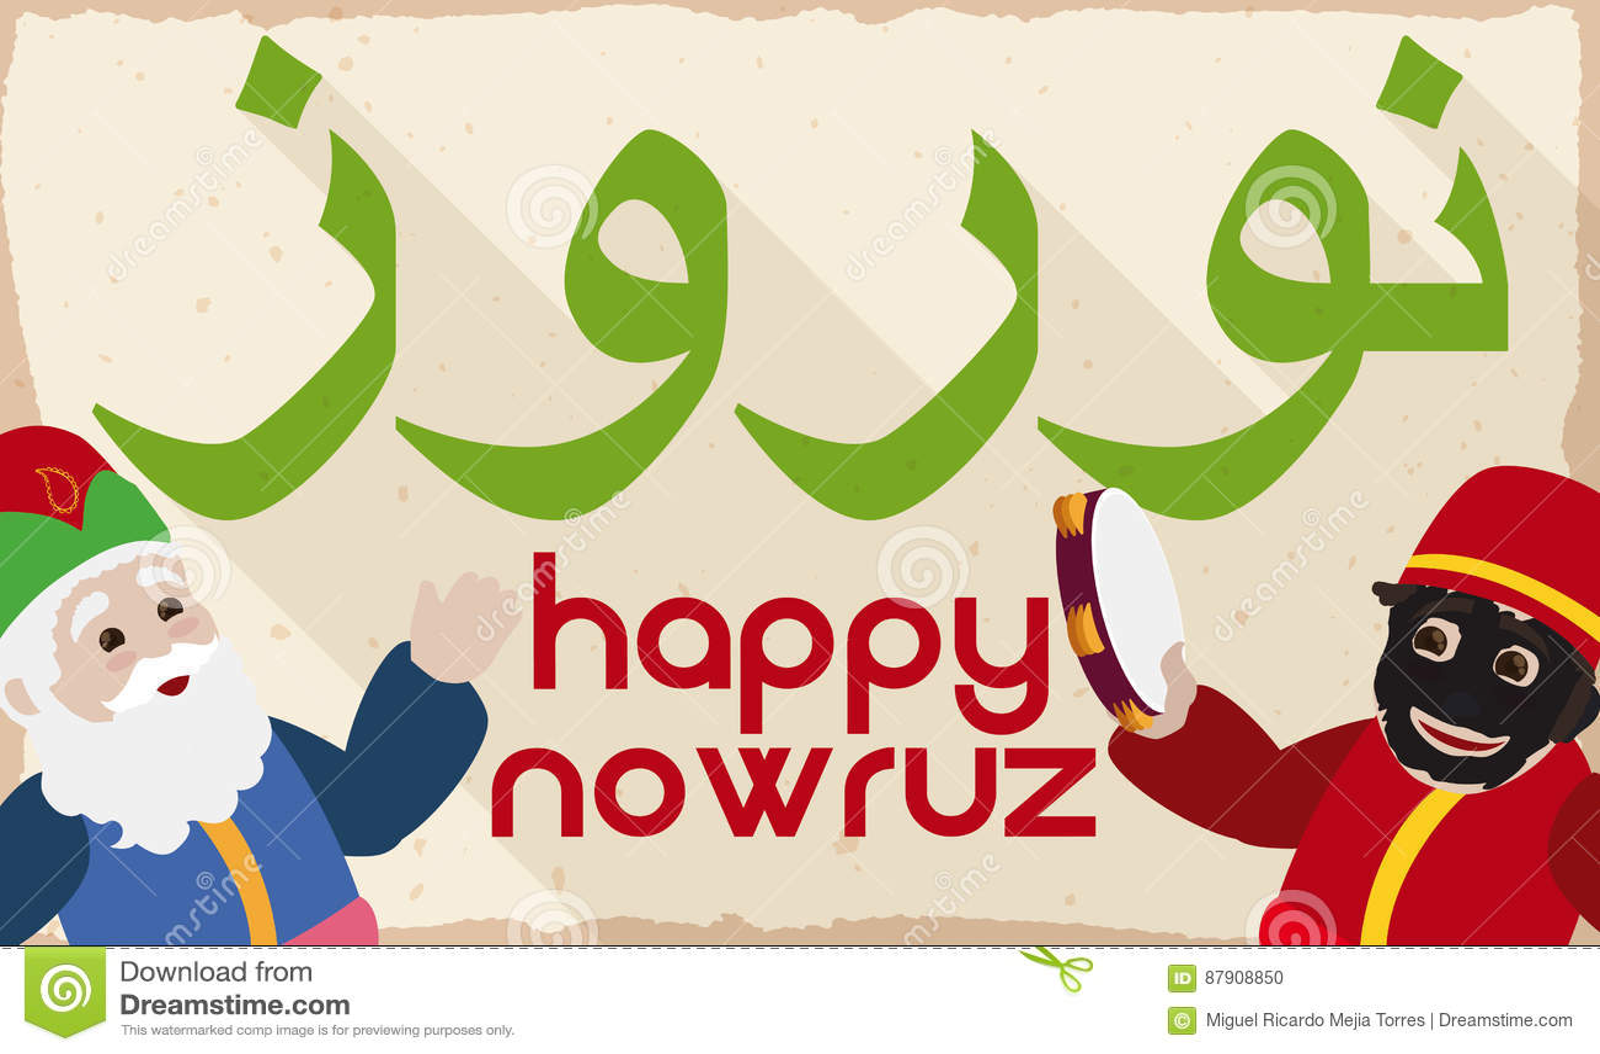 Nowruz Stock Illustrations 221 Nowruz Stock Illustrations Vectors